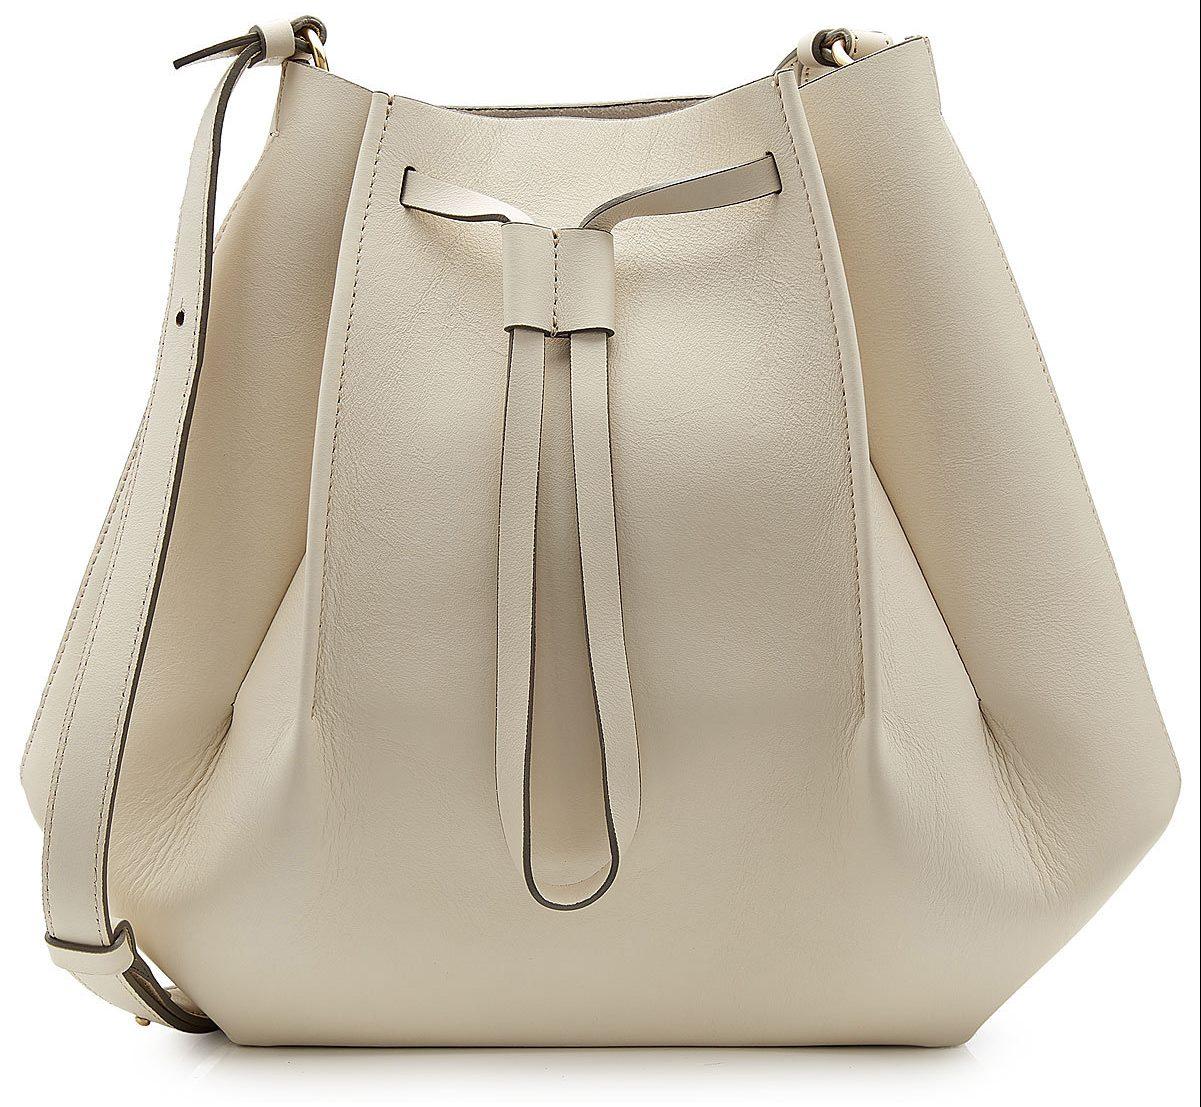 Maison Margiela Leather Shoulder Bag with Drawstring